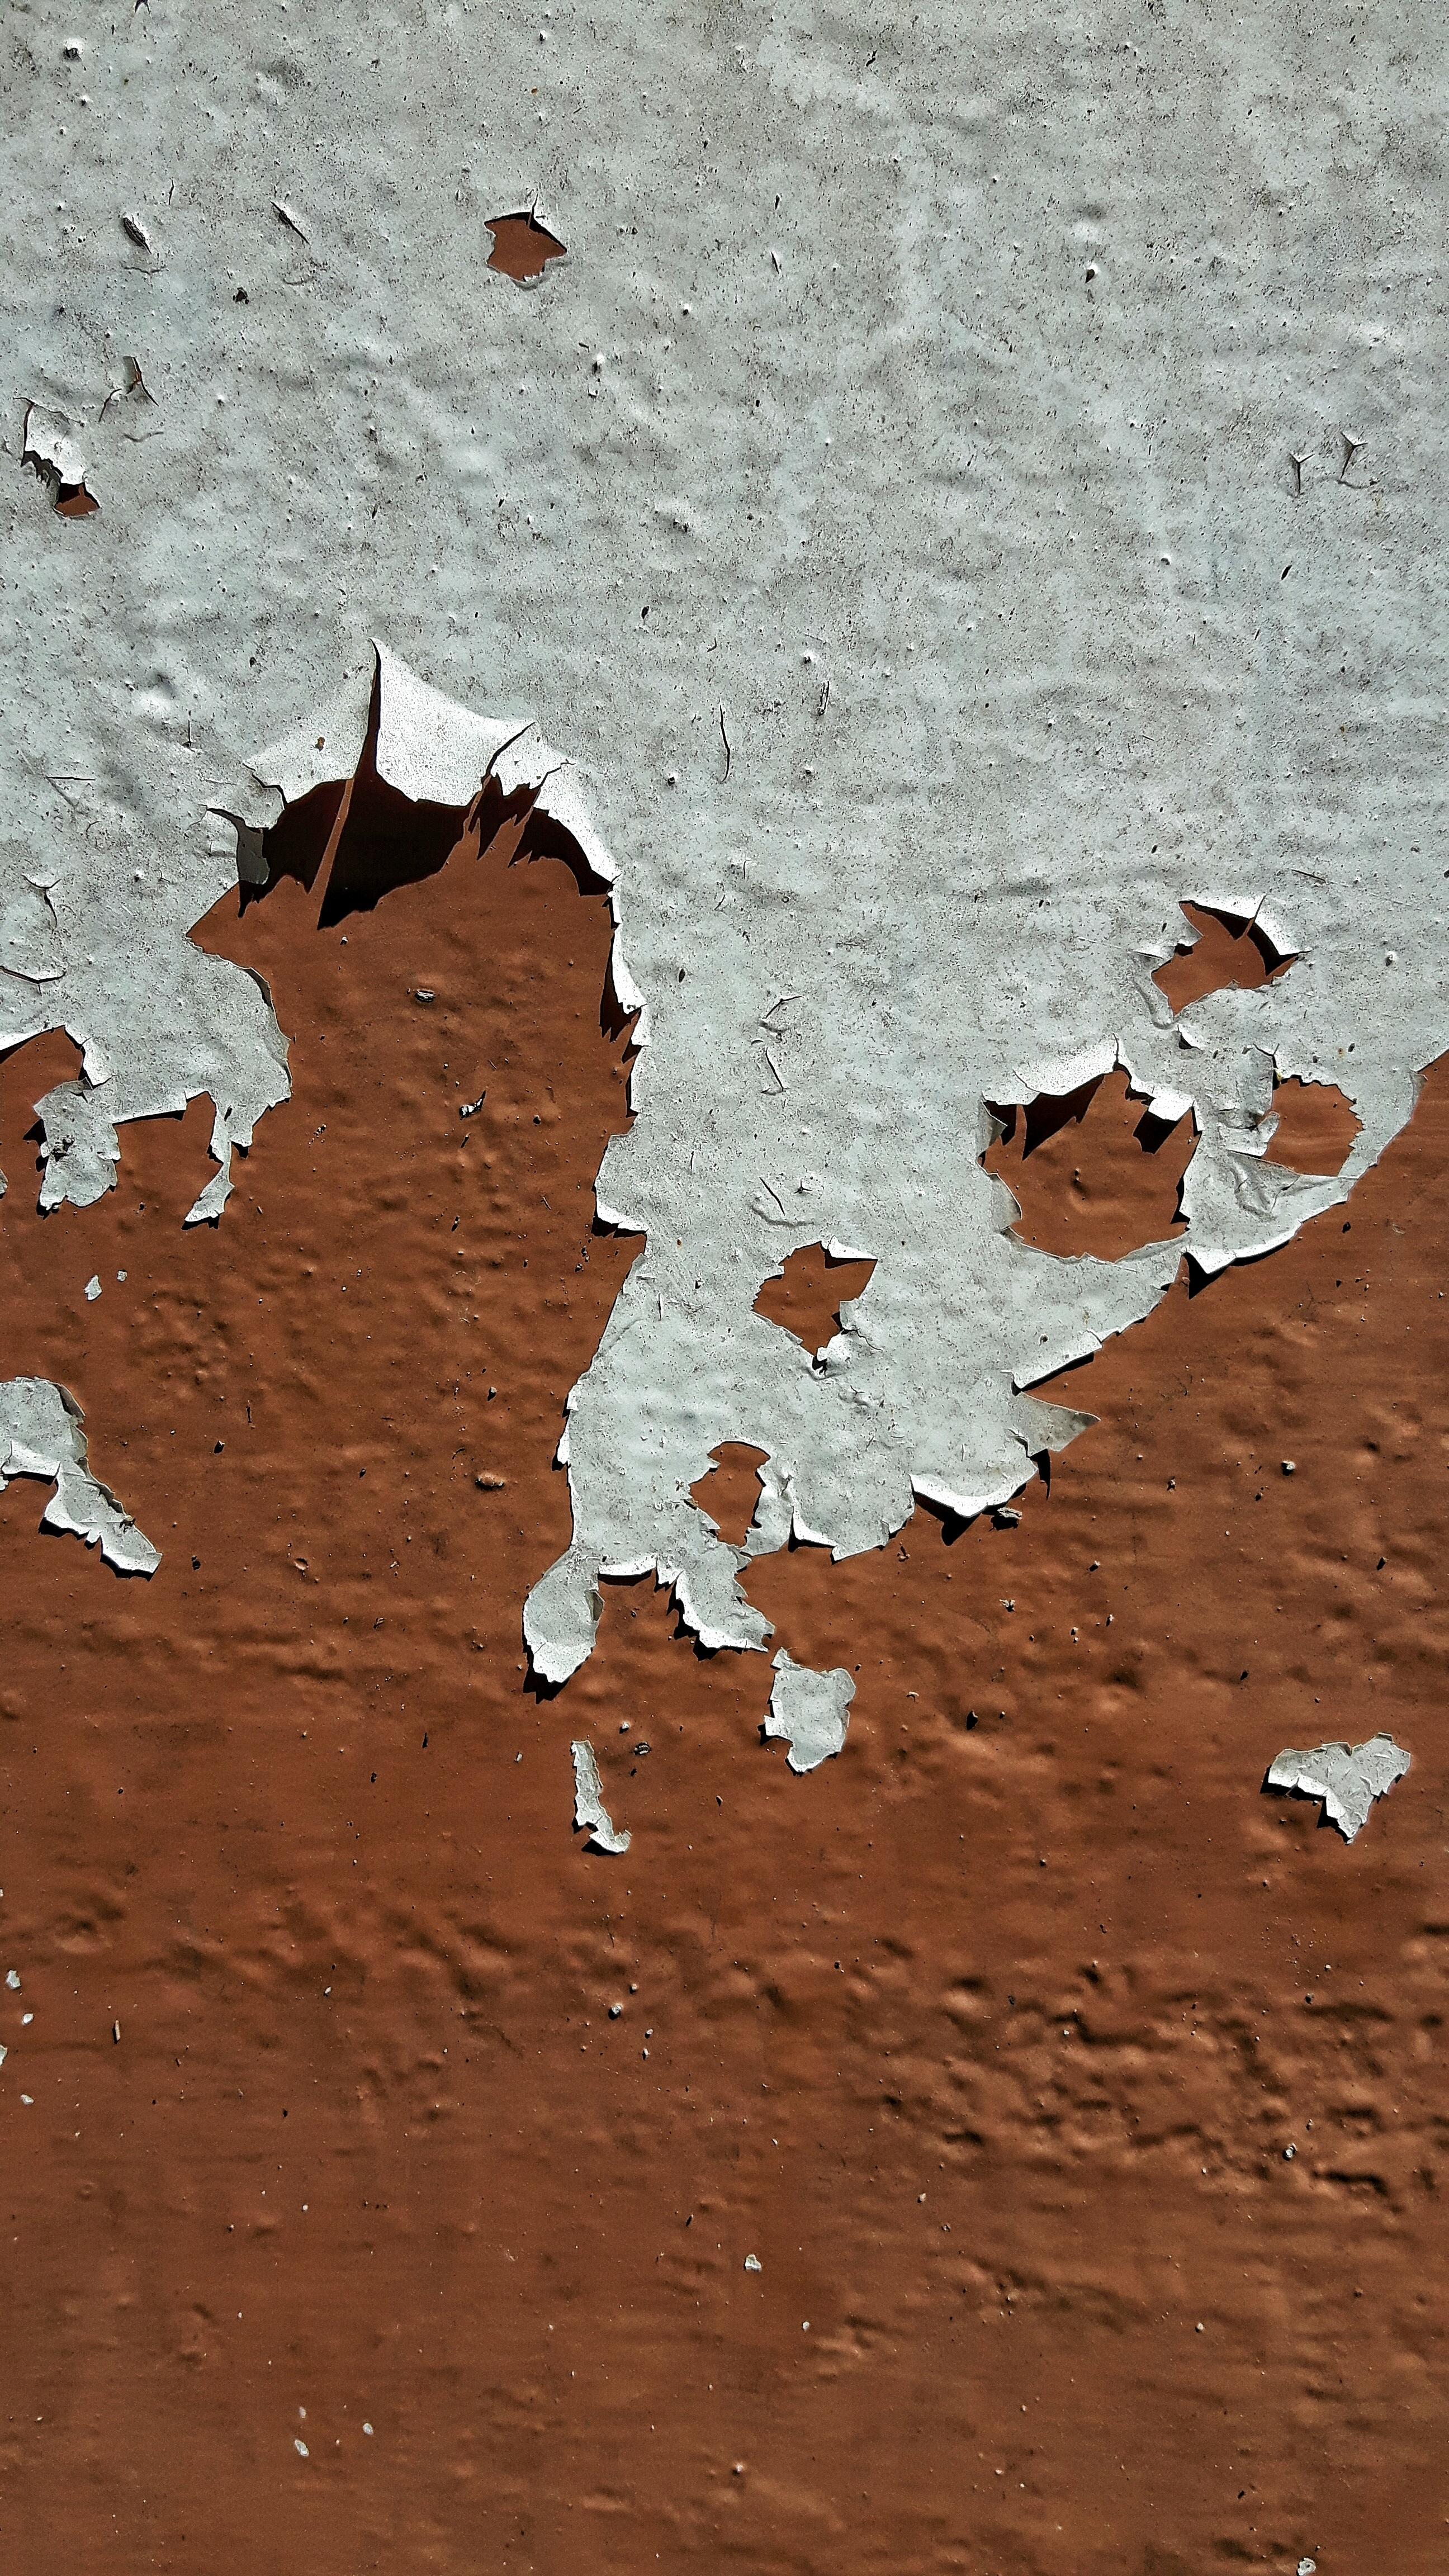 Kostenlose foto : Baum, Holz, Textur, Blatt, Stock, Nummer, Mauer ...